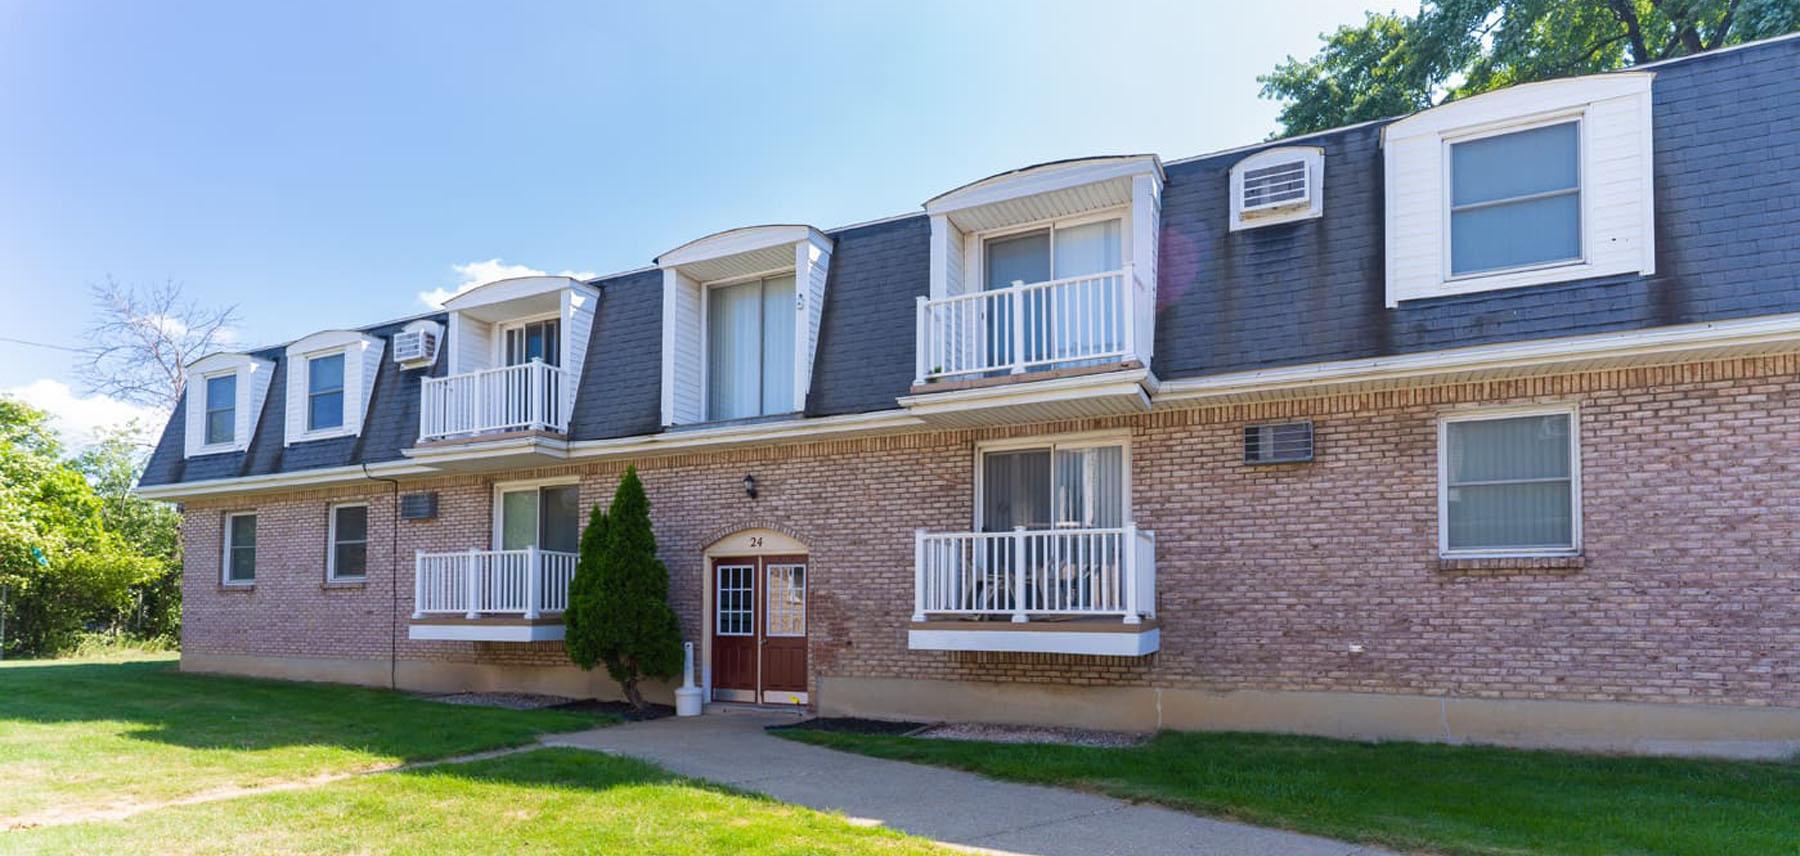 Culver Terrace Apartments